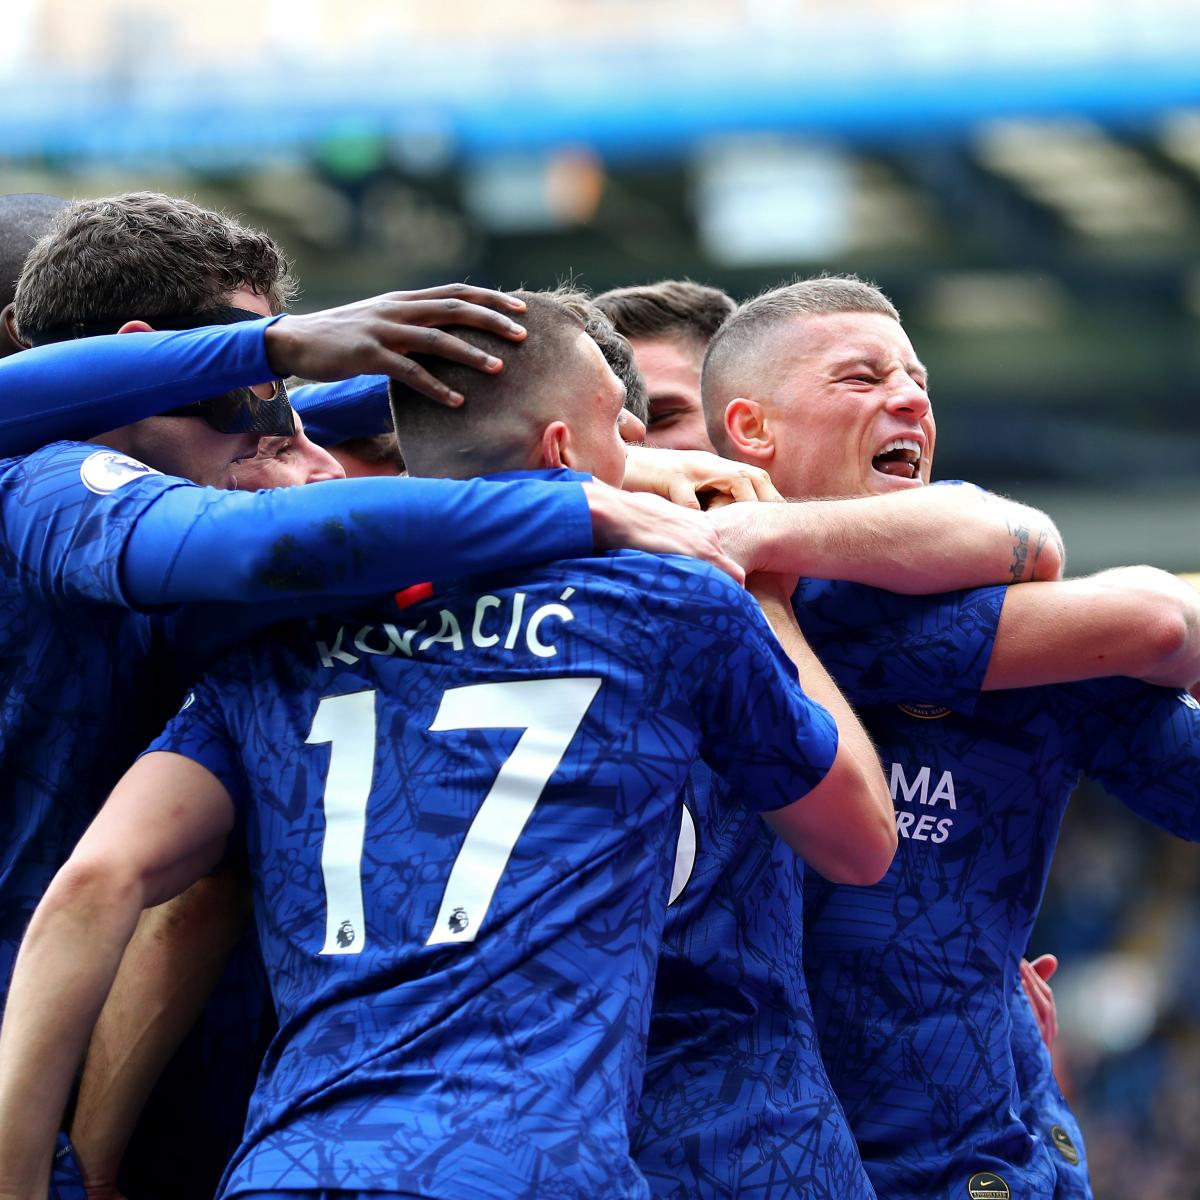 Olivier Giroud, Marcos Alonso Lead Chelsea to Dominant Win vs. Tottenham